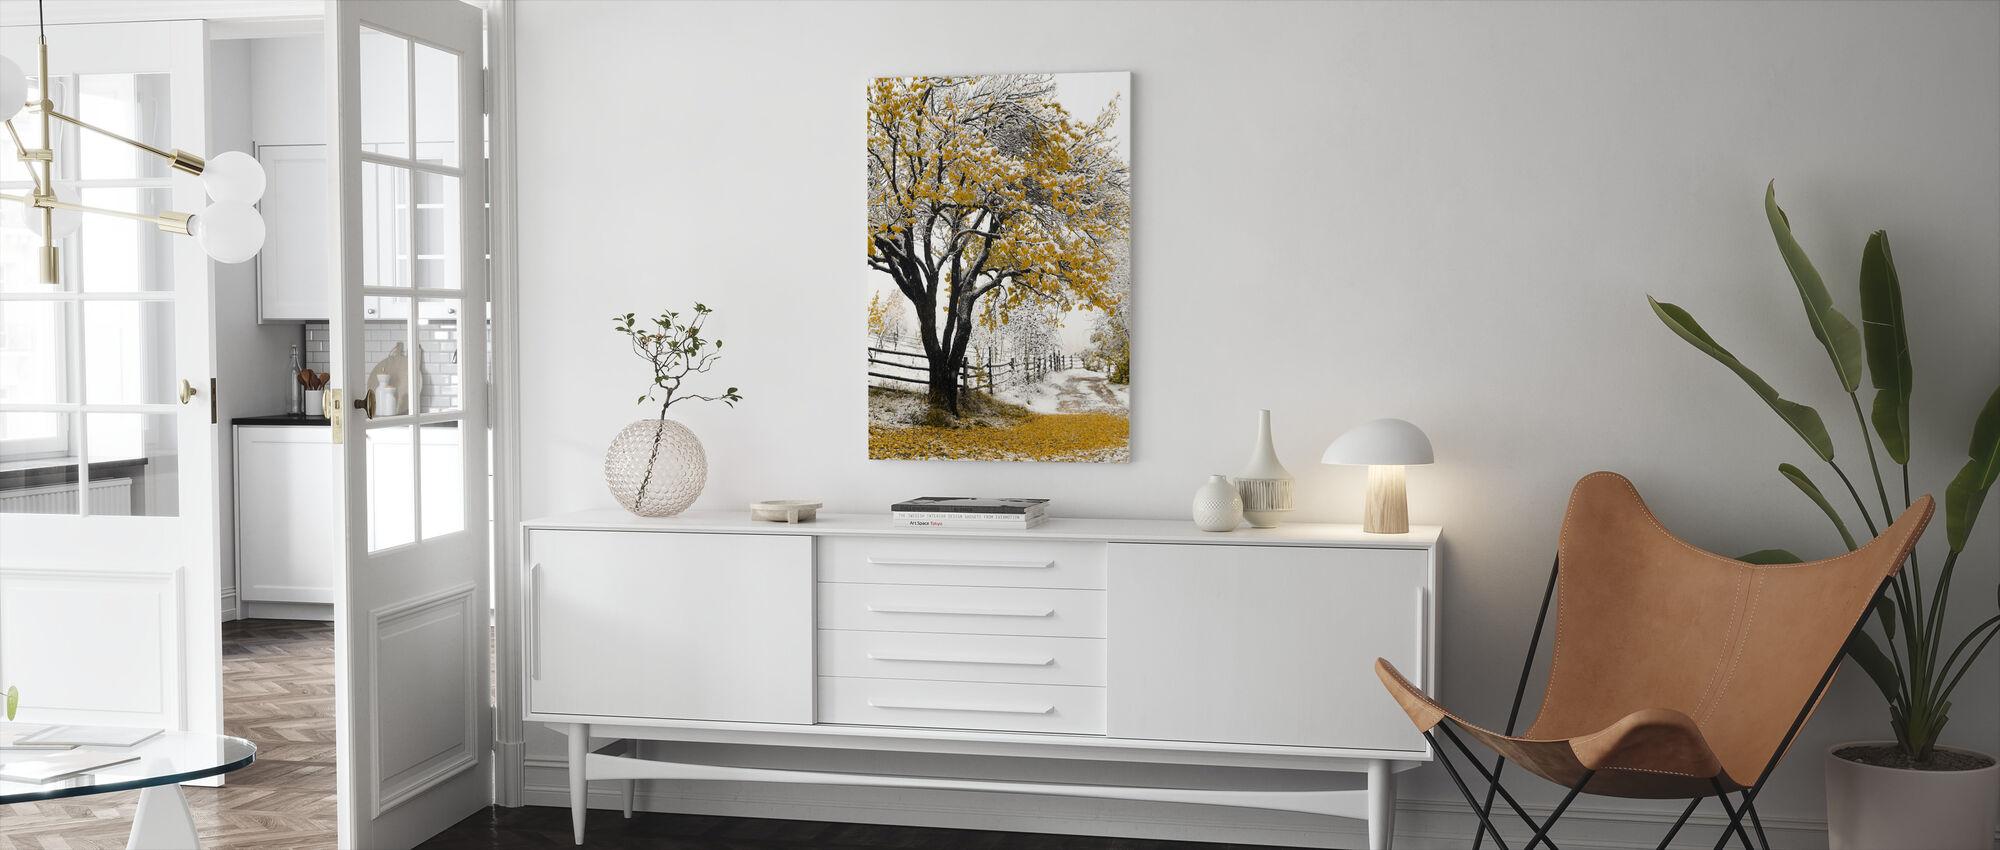 Aprikosträd - Canvastavla - Vardagsrum